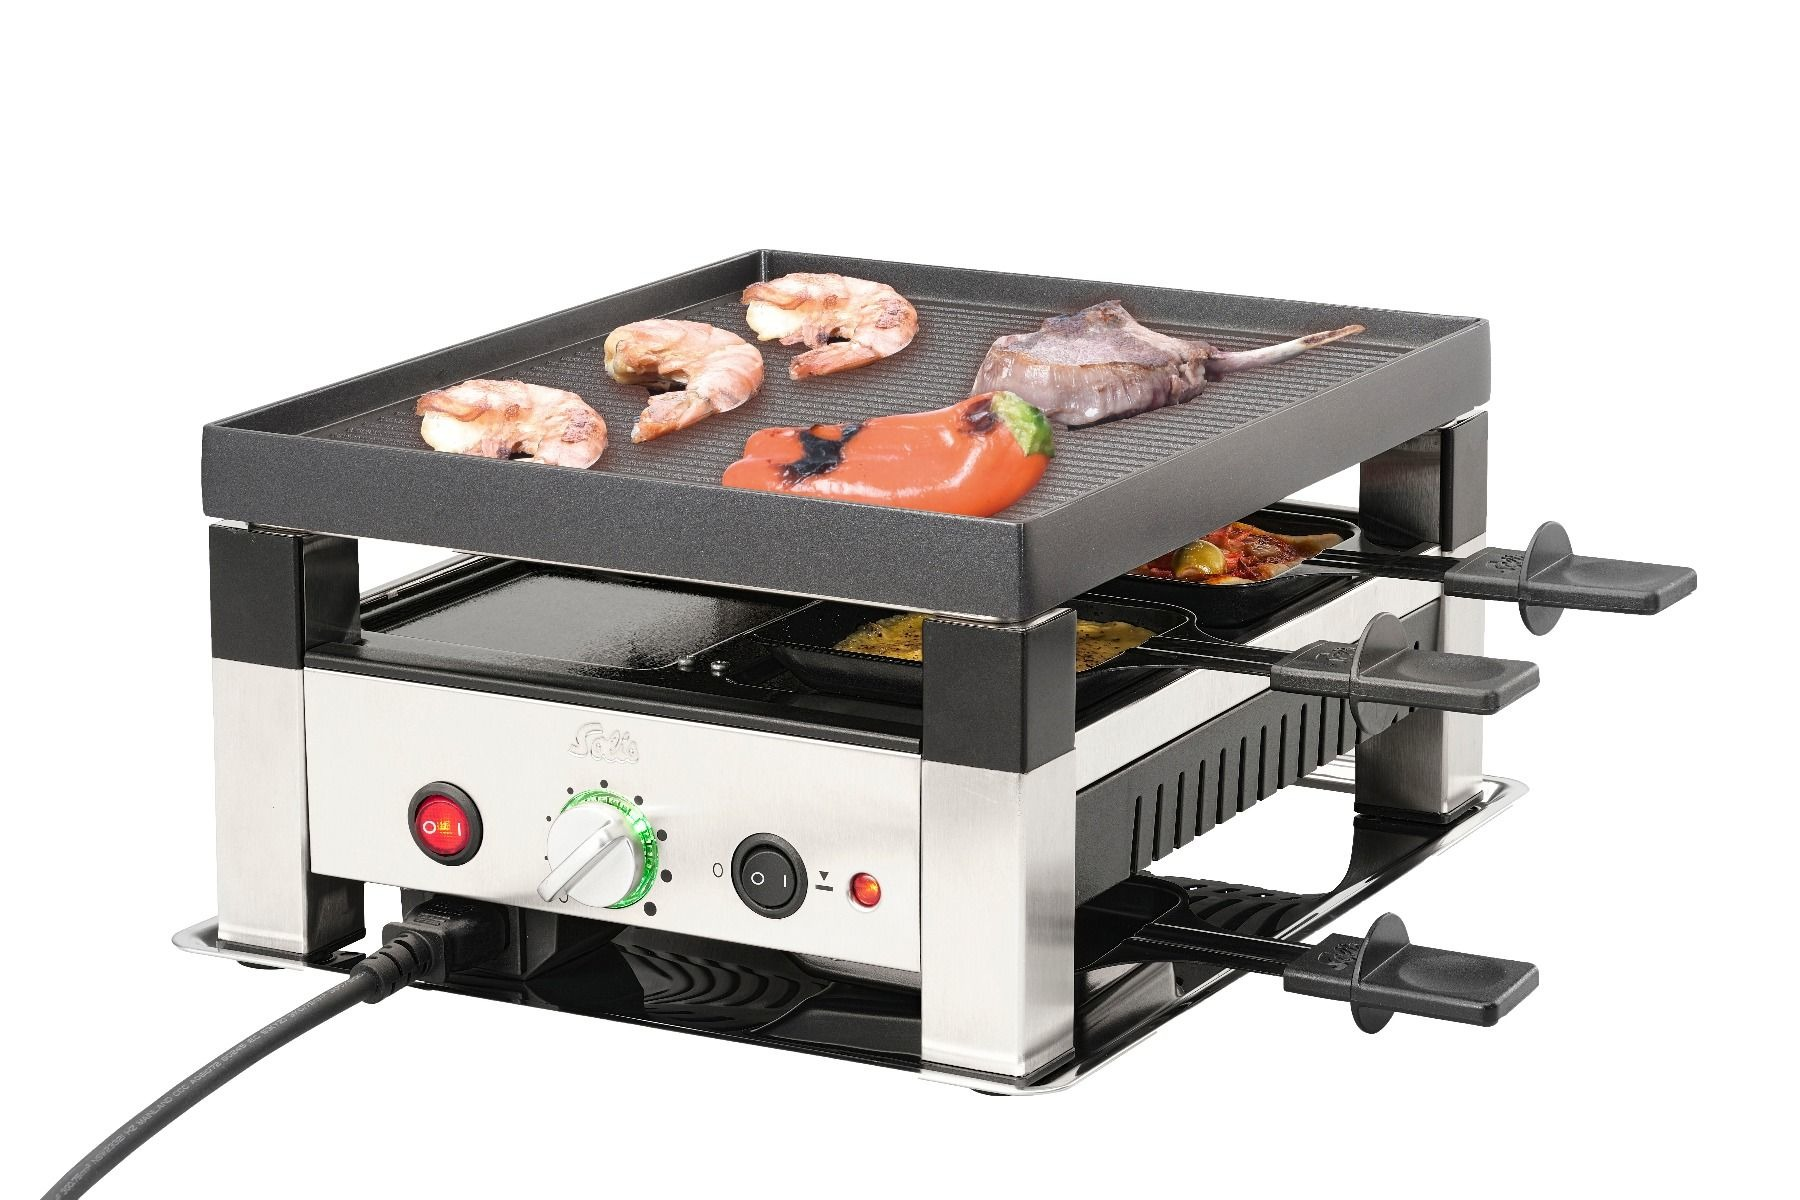 Solis 5 in 1 Table Grill for 4 7910 Grill Apparaat Gourmetstel 4 personen online kopen